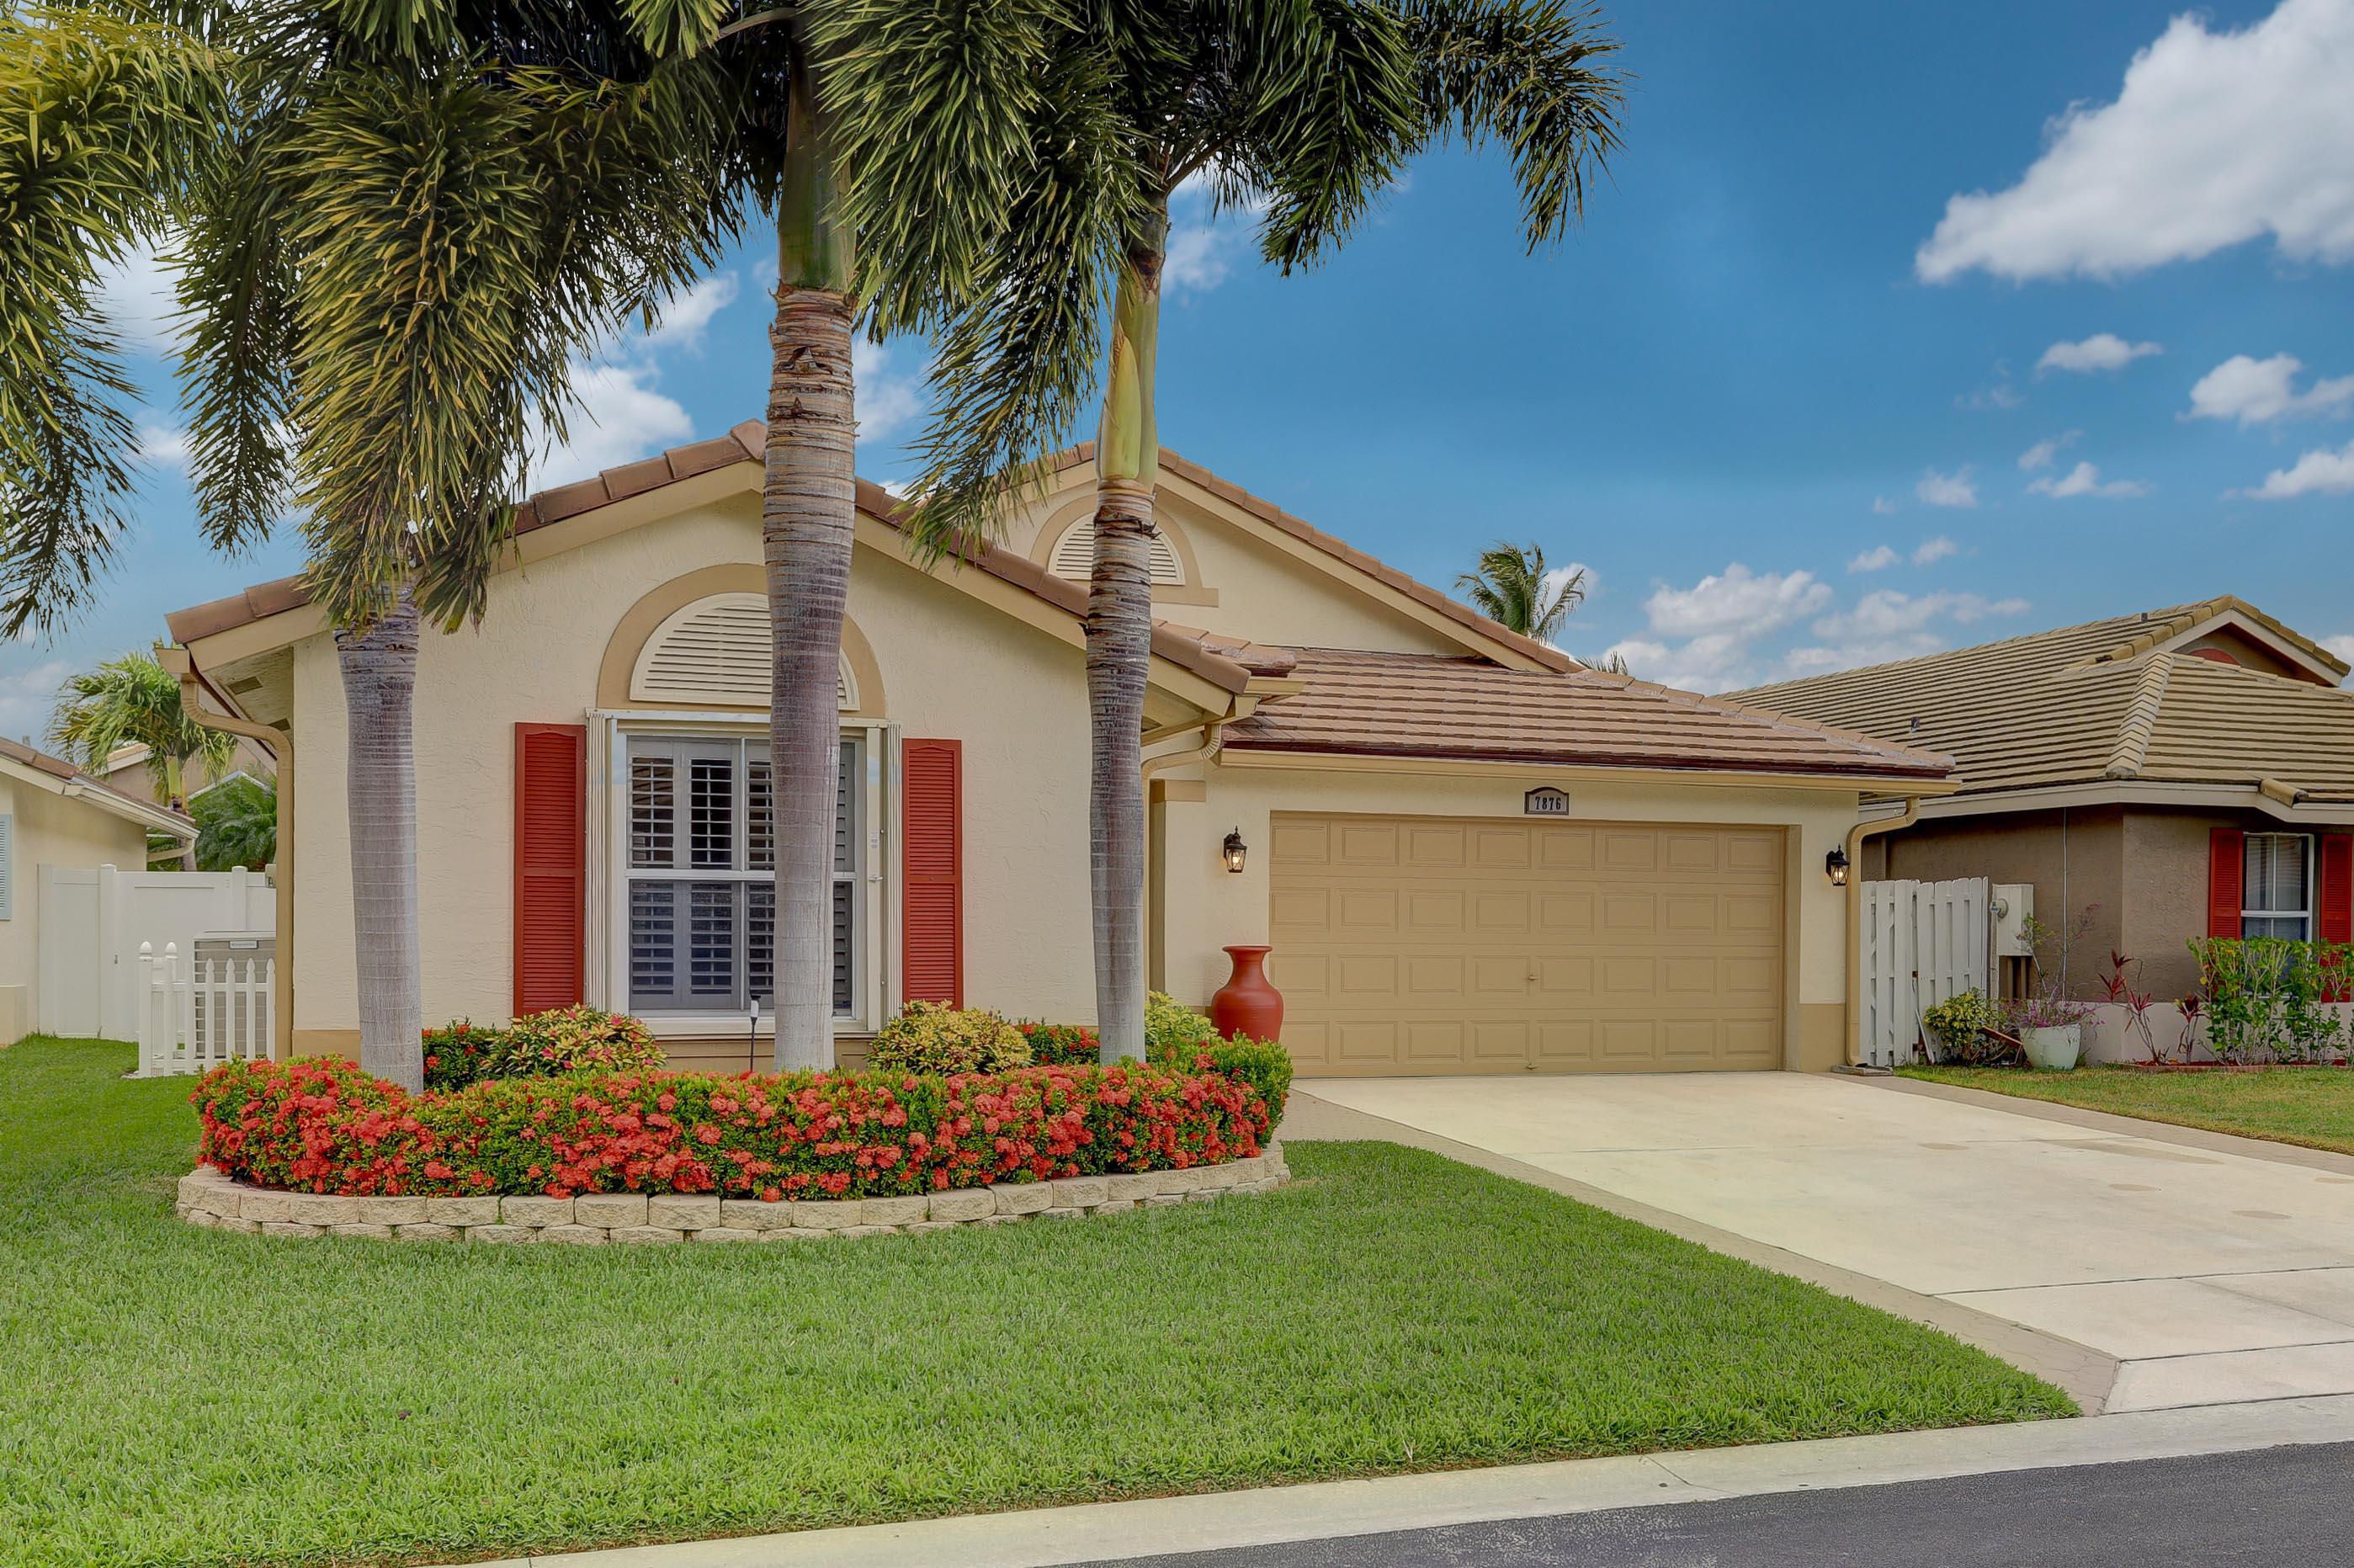 Home for sale in Lawrence Oaks Boynton Beach Florida